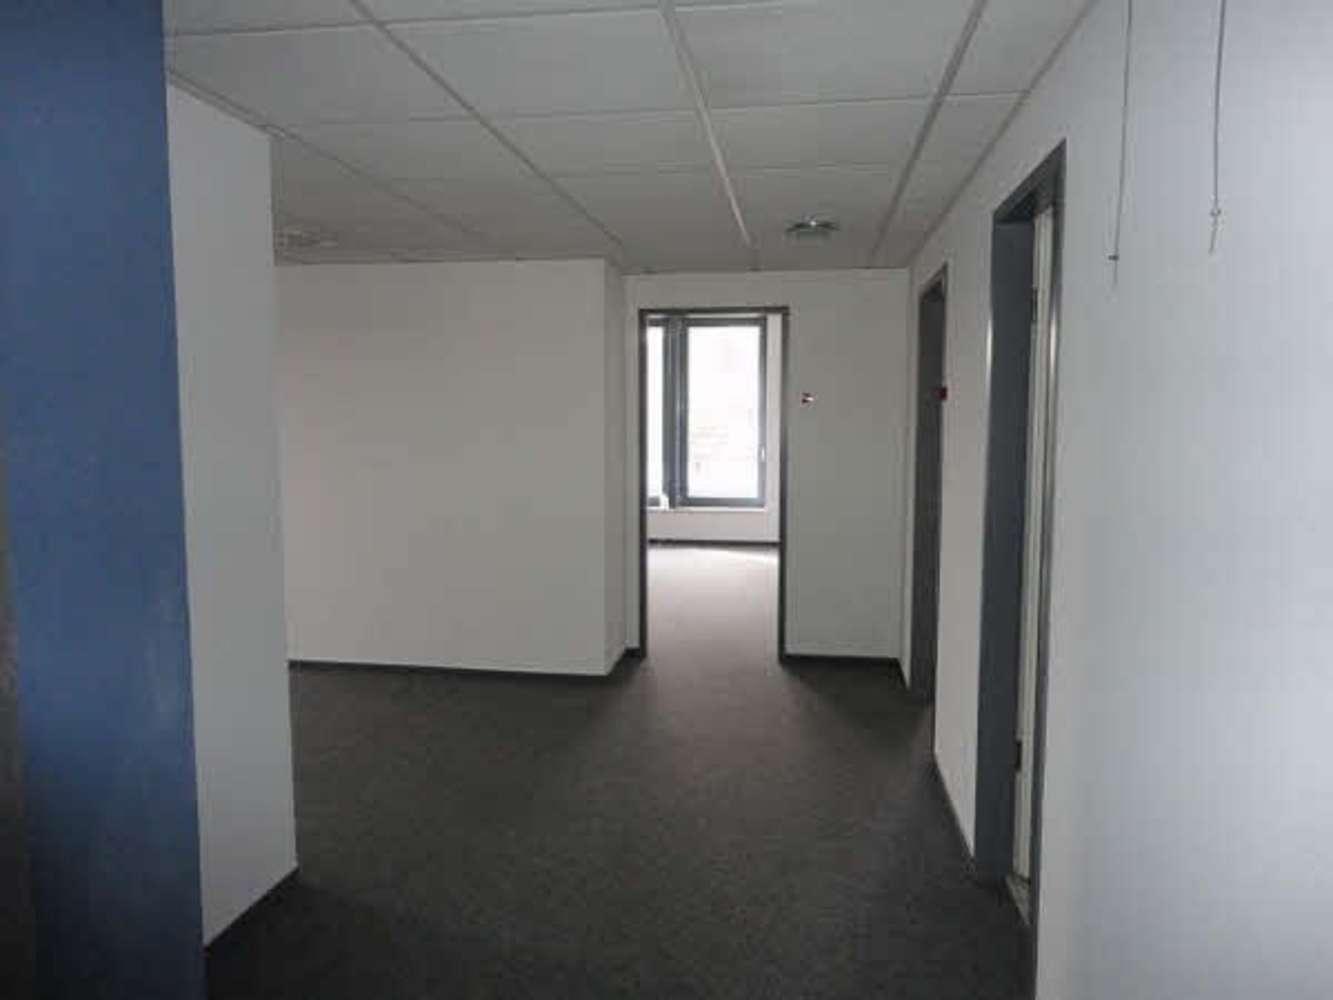 Büros Frankfurt am main, 60599 - Büro - Frankfurt am Main, Sachsenhausen - F1443 - 9405096